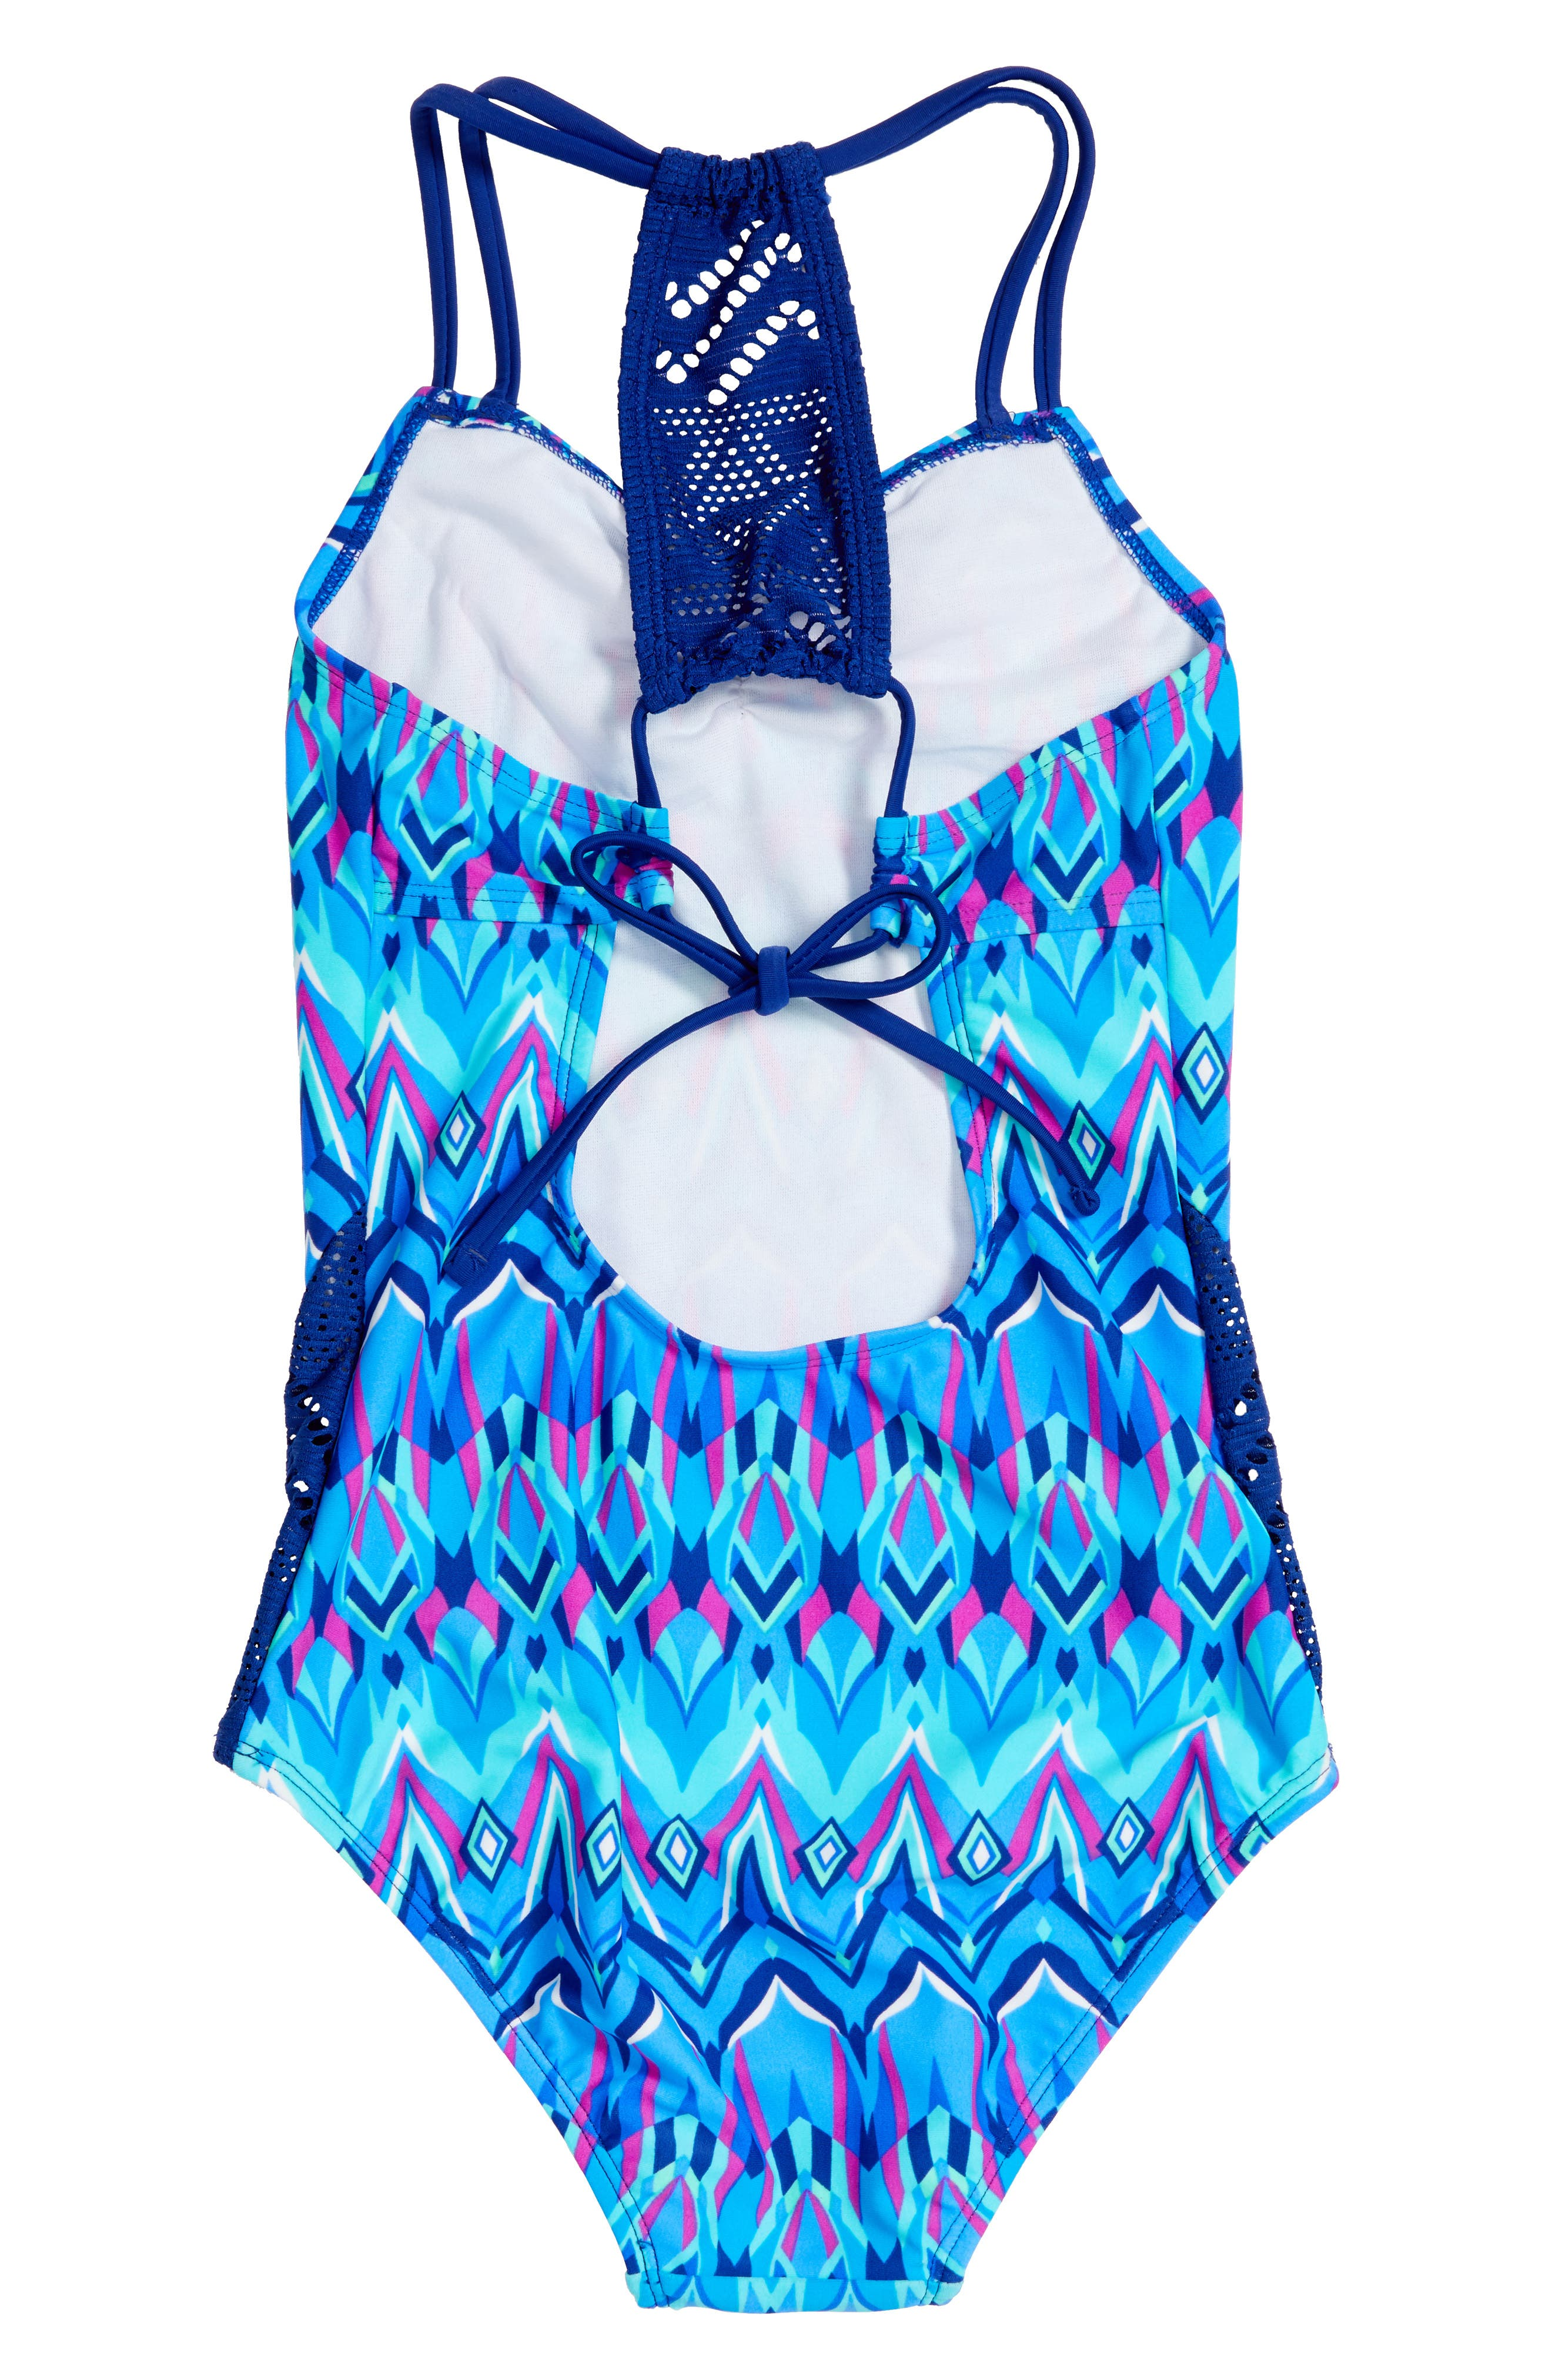 Kaleidoscope One-Piece Swimsuit,                             Alternate thumbnail 2, color,                             476